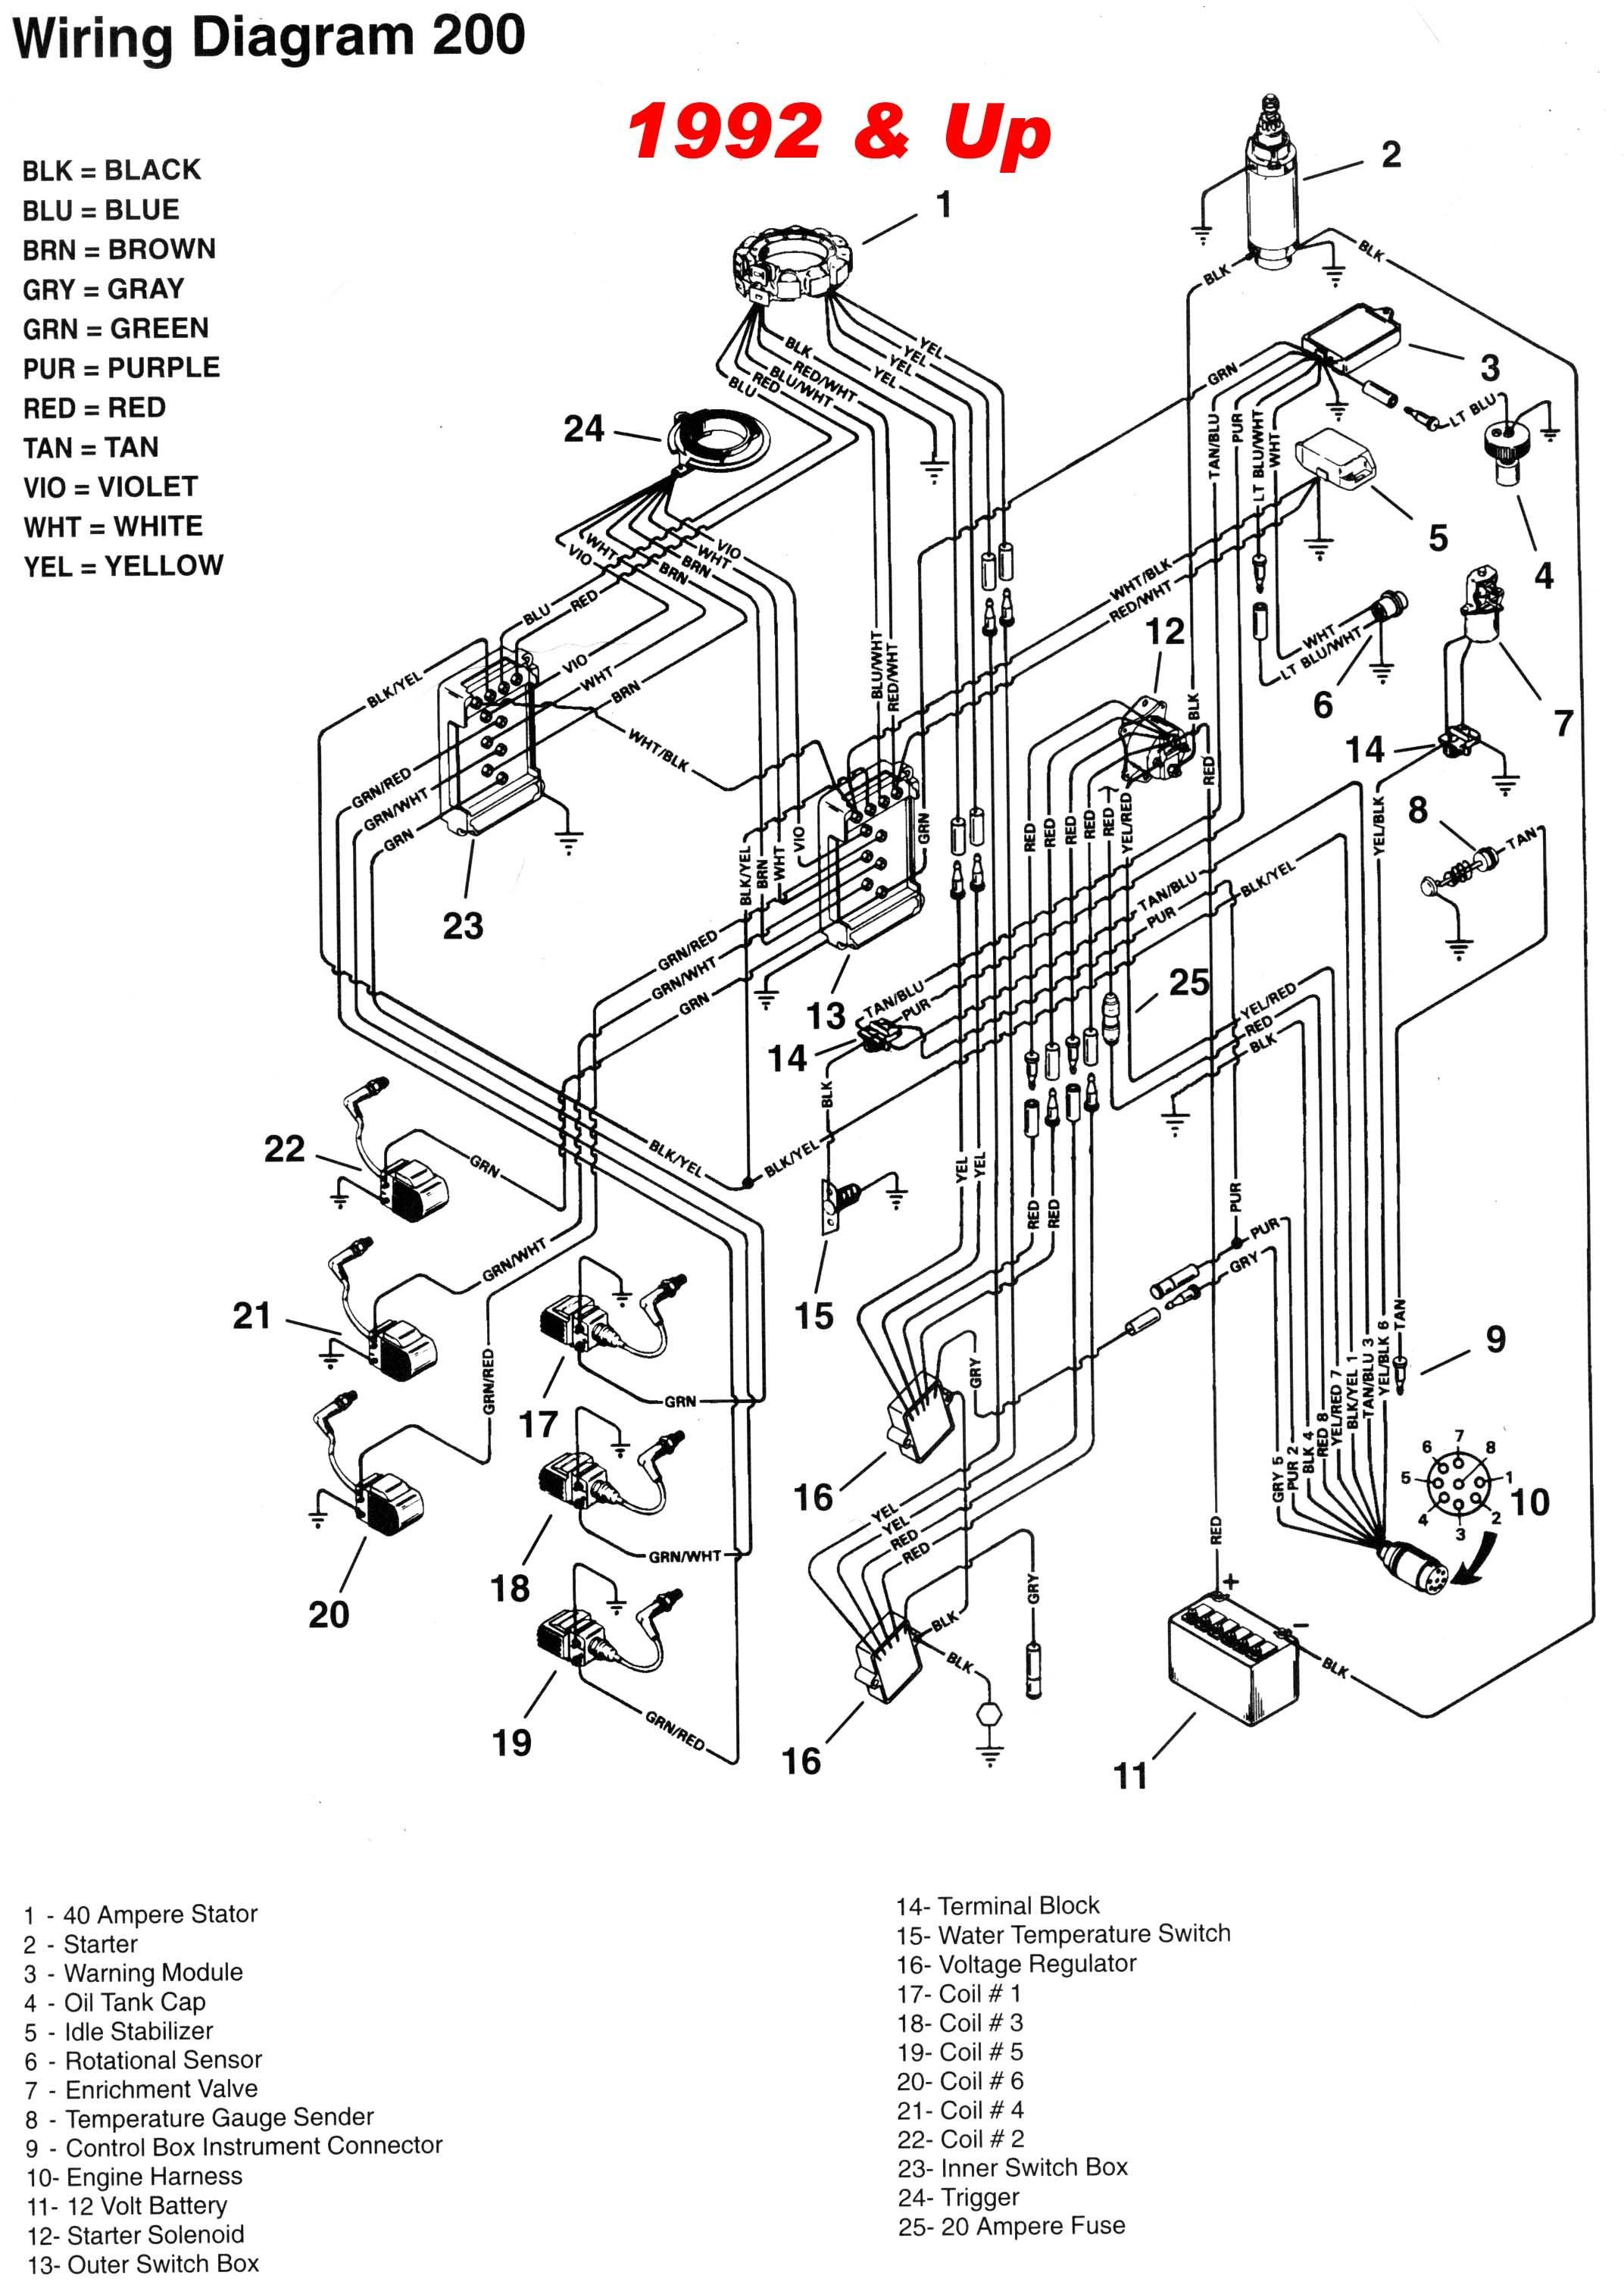 Stupendous Mercruiser Wiring Harness Basic Electronics Wiring Diagram Wiring Cloud Hisonepsysticxongrecoveryedborg